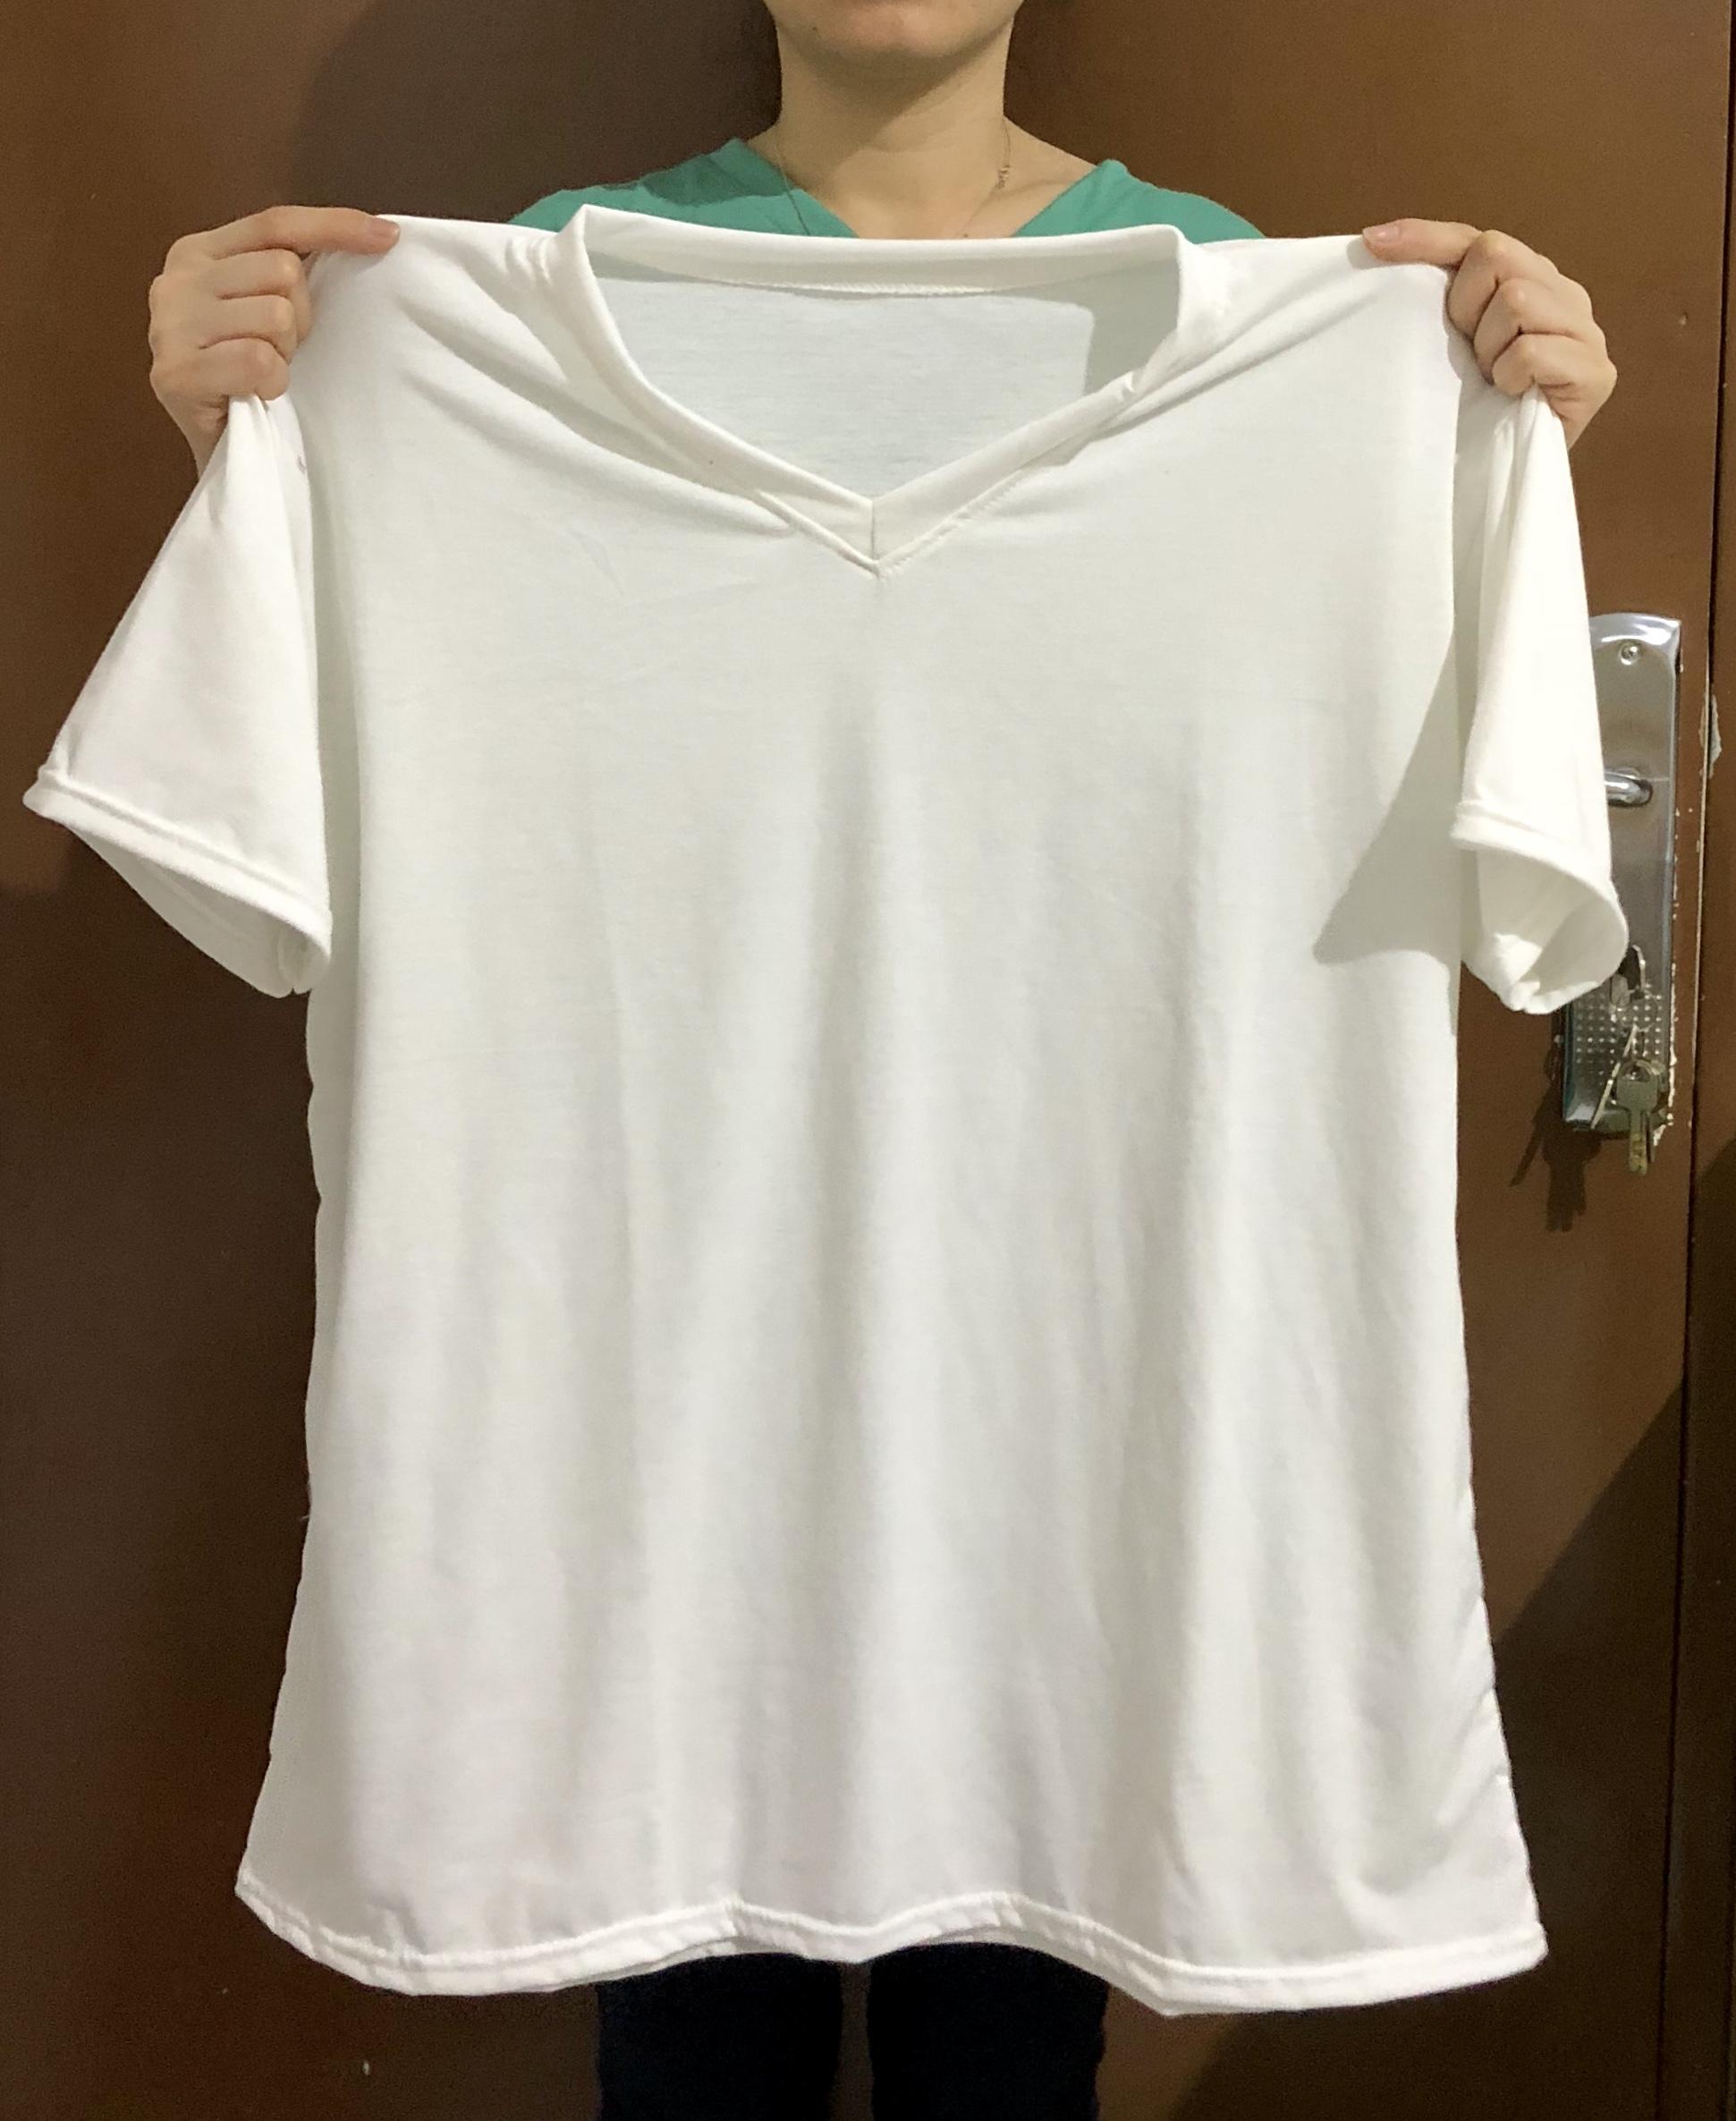 720 Desain Baju Polos Putih Panjang HD